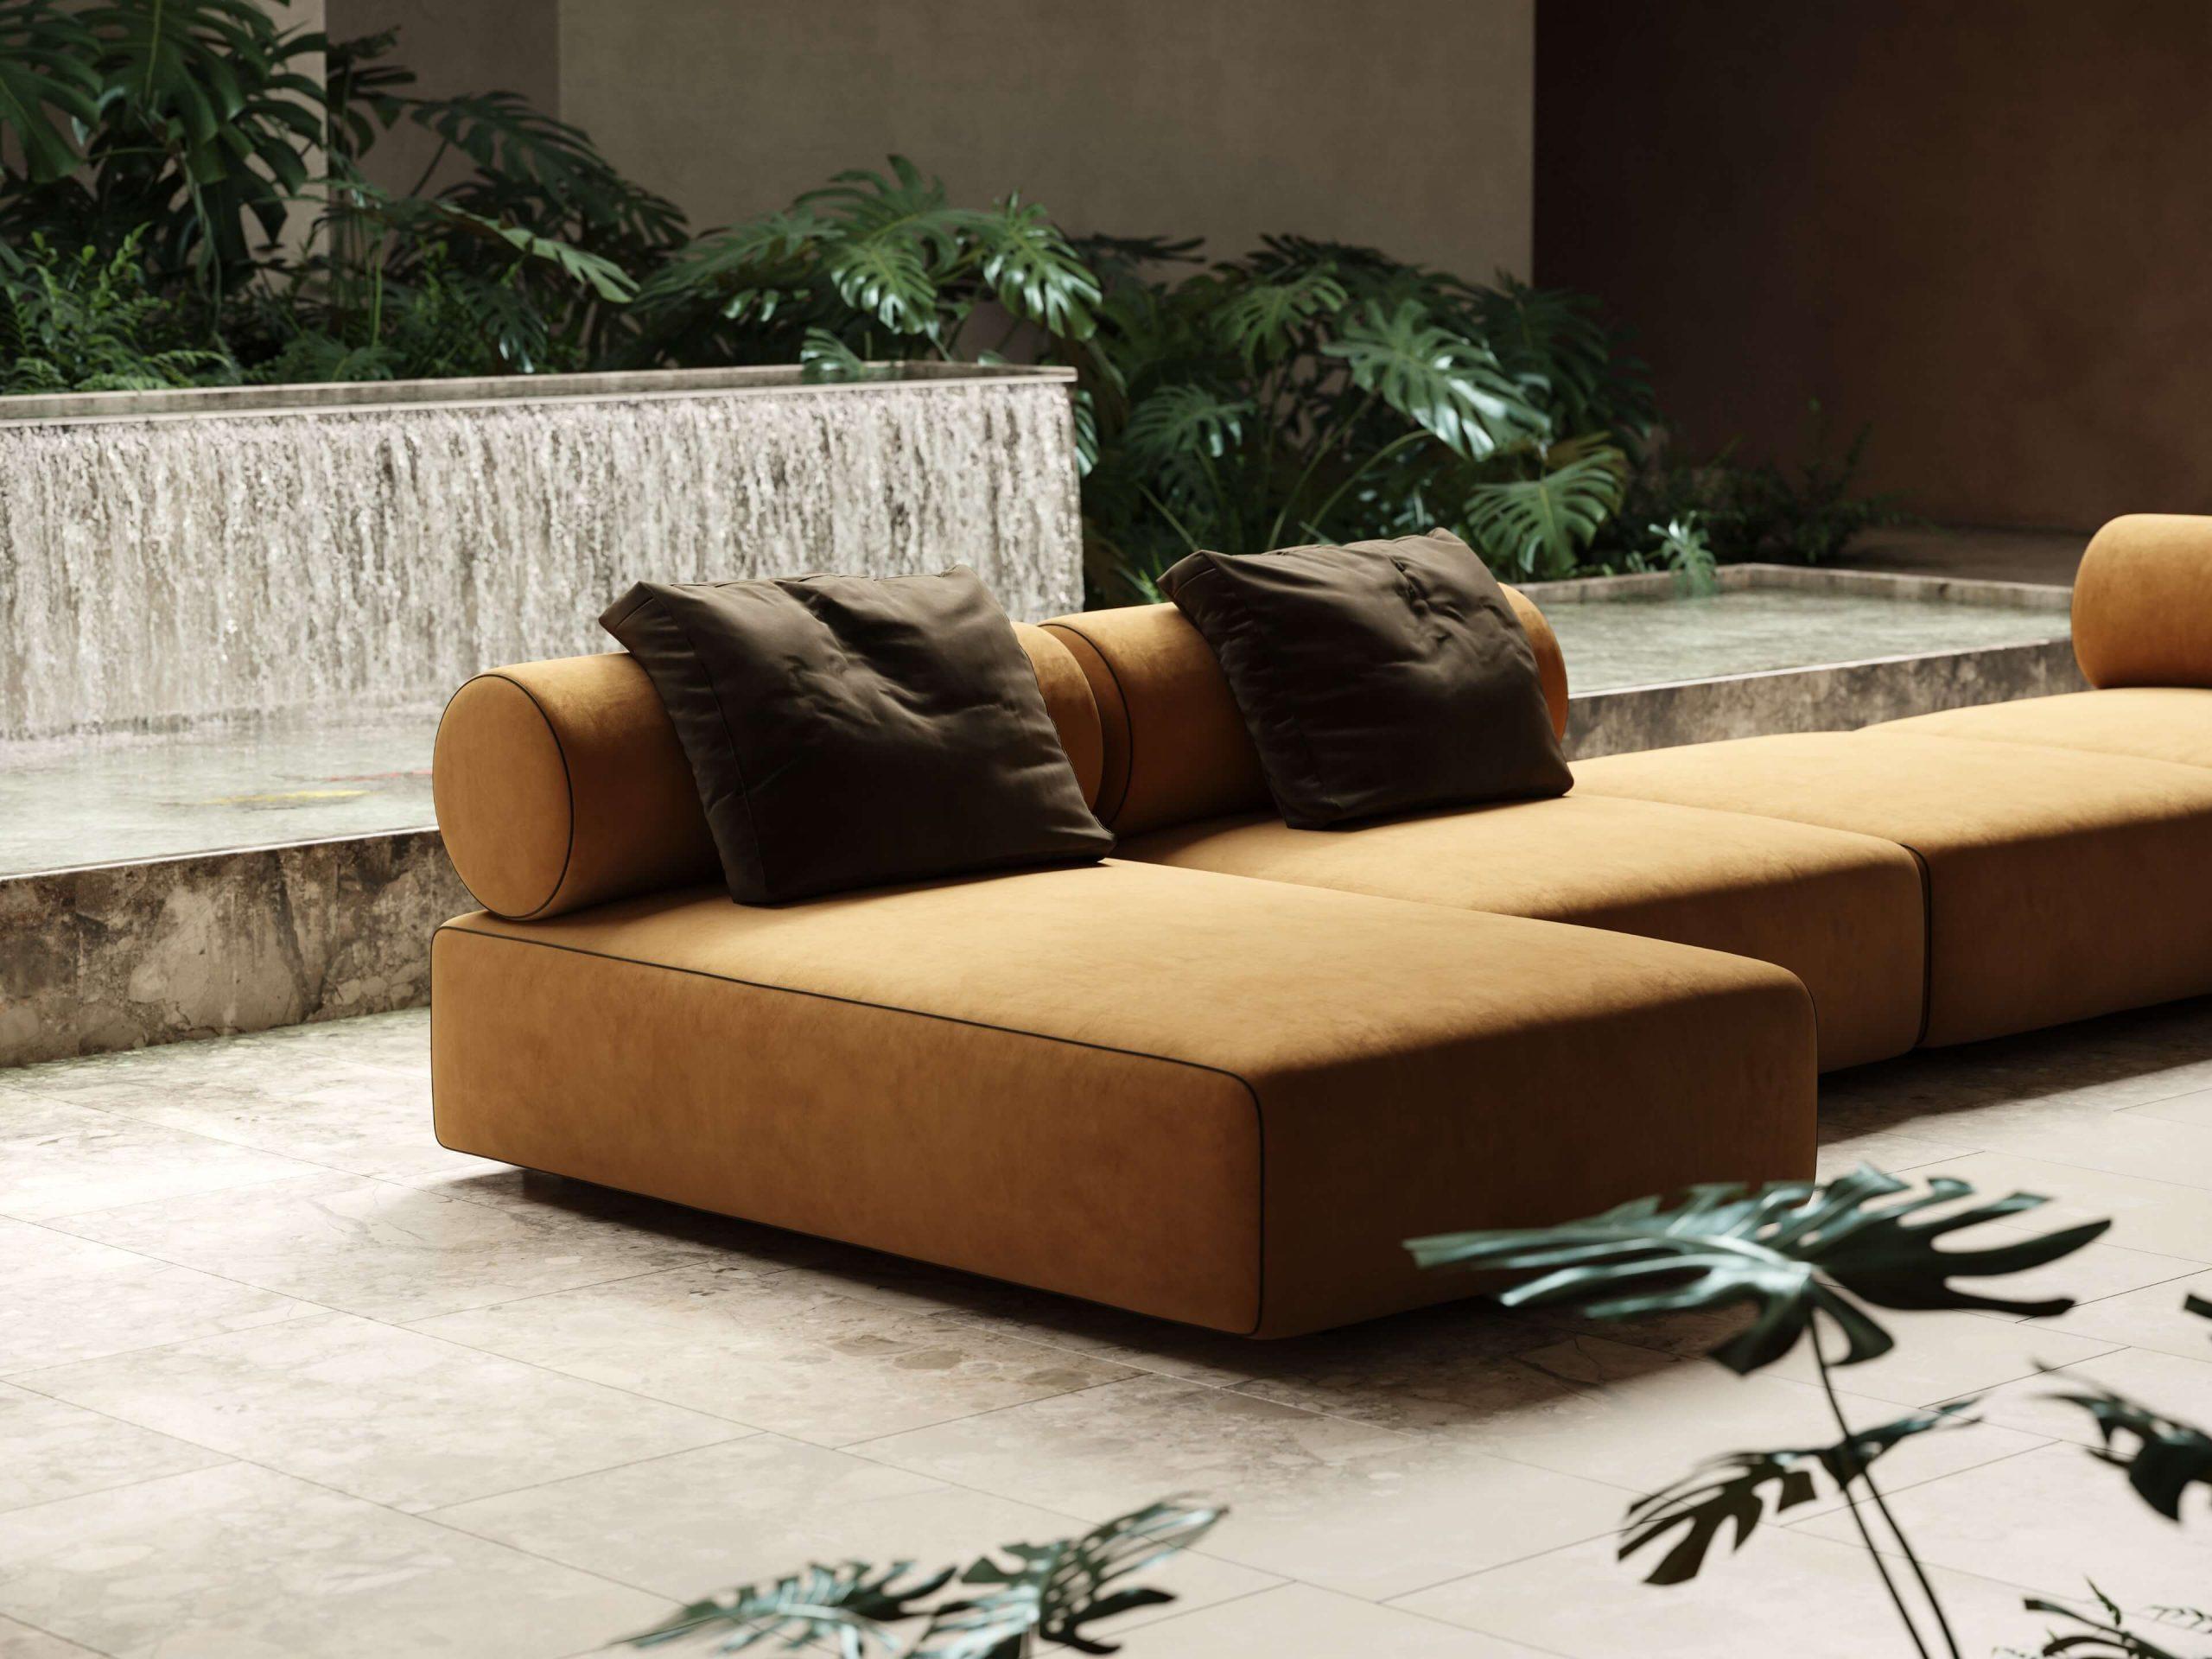 shinto-sofa-velvet-modular-sofa-round-design-living-room-domkapa